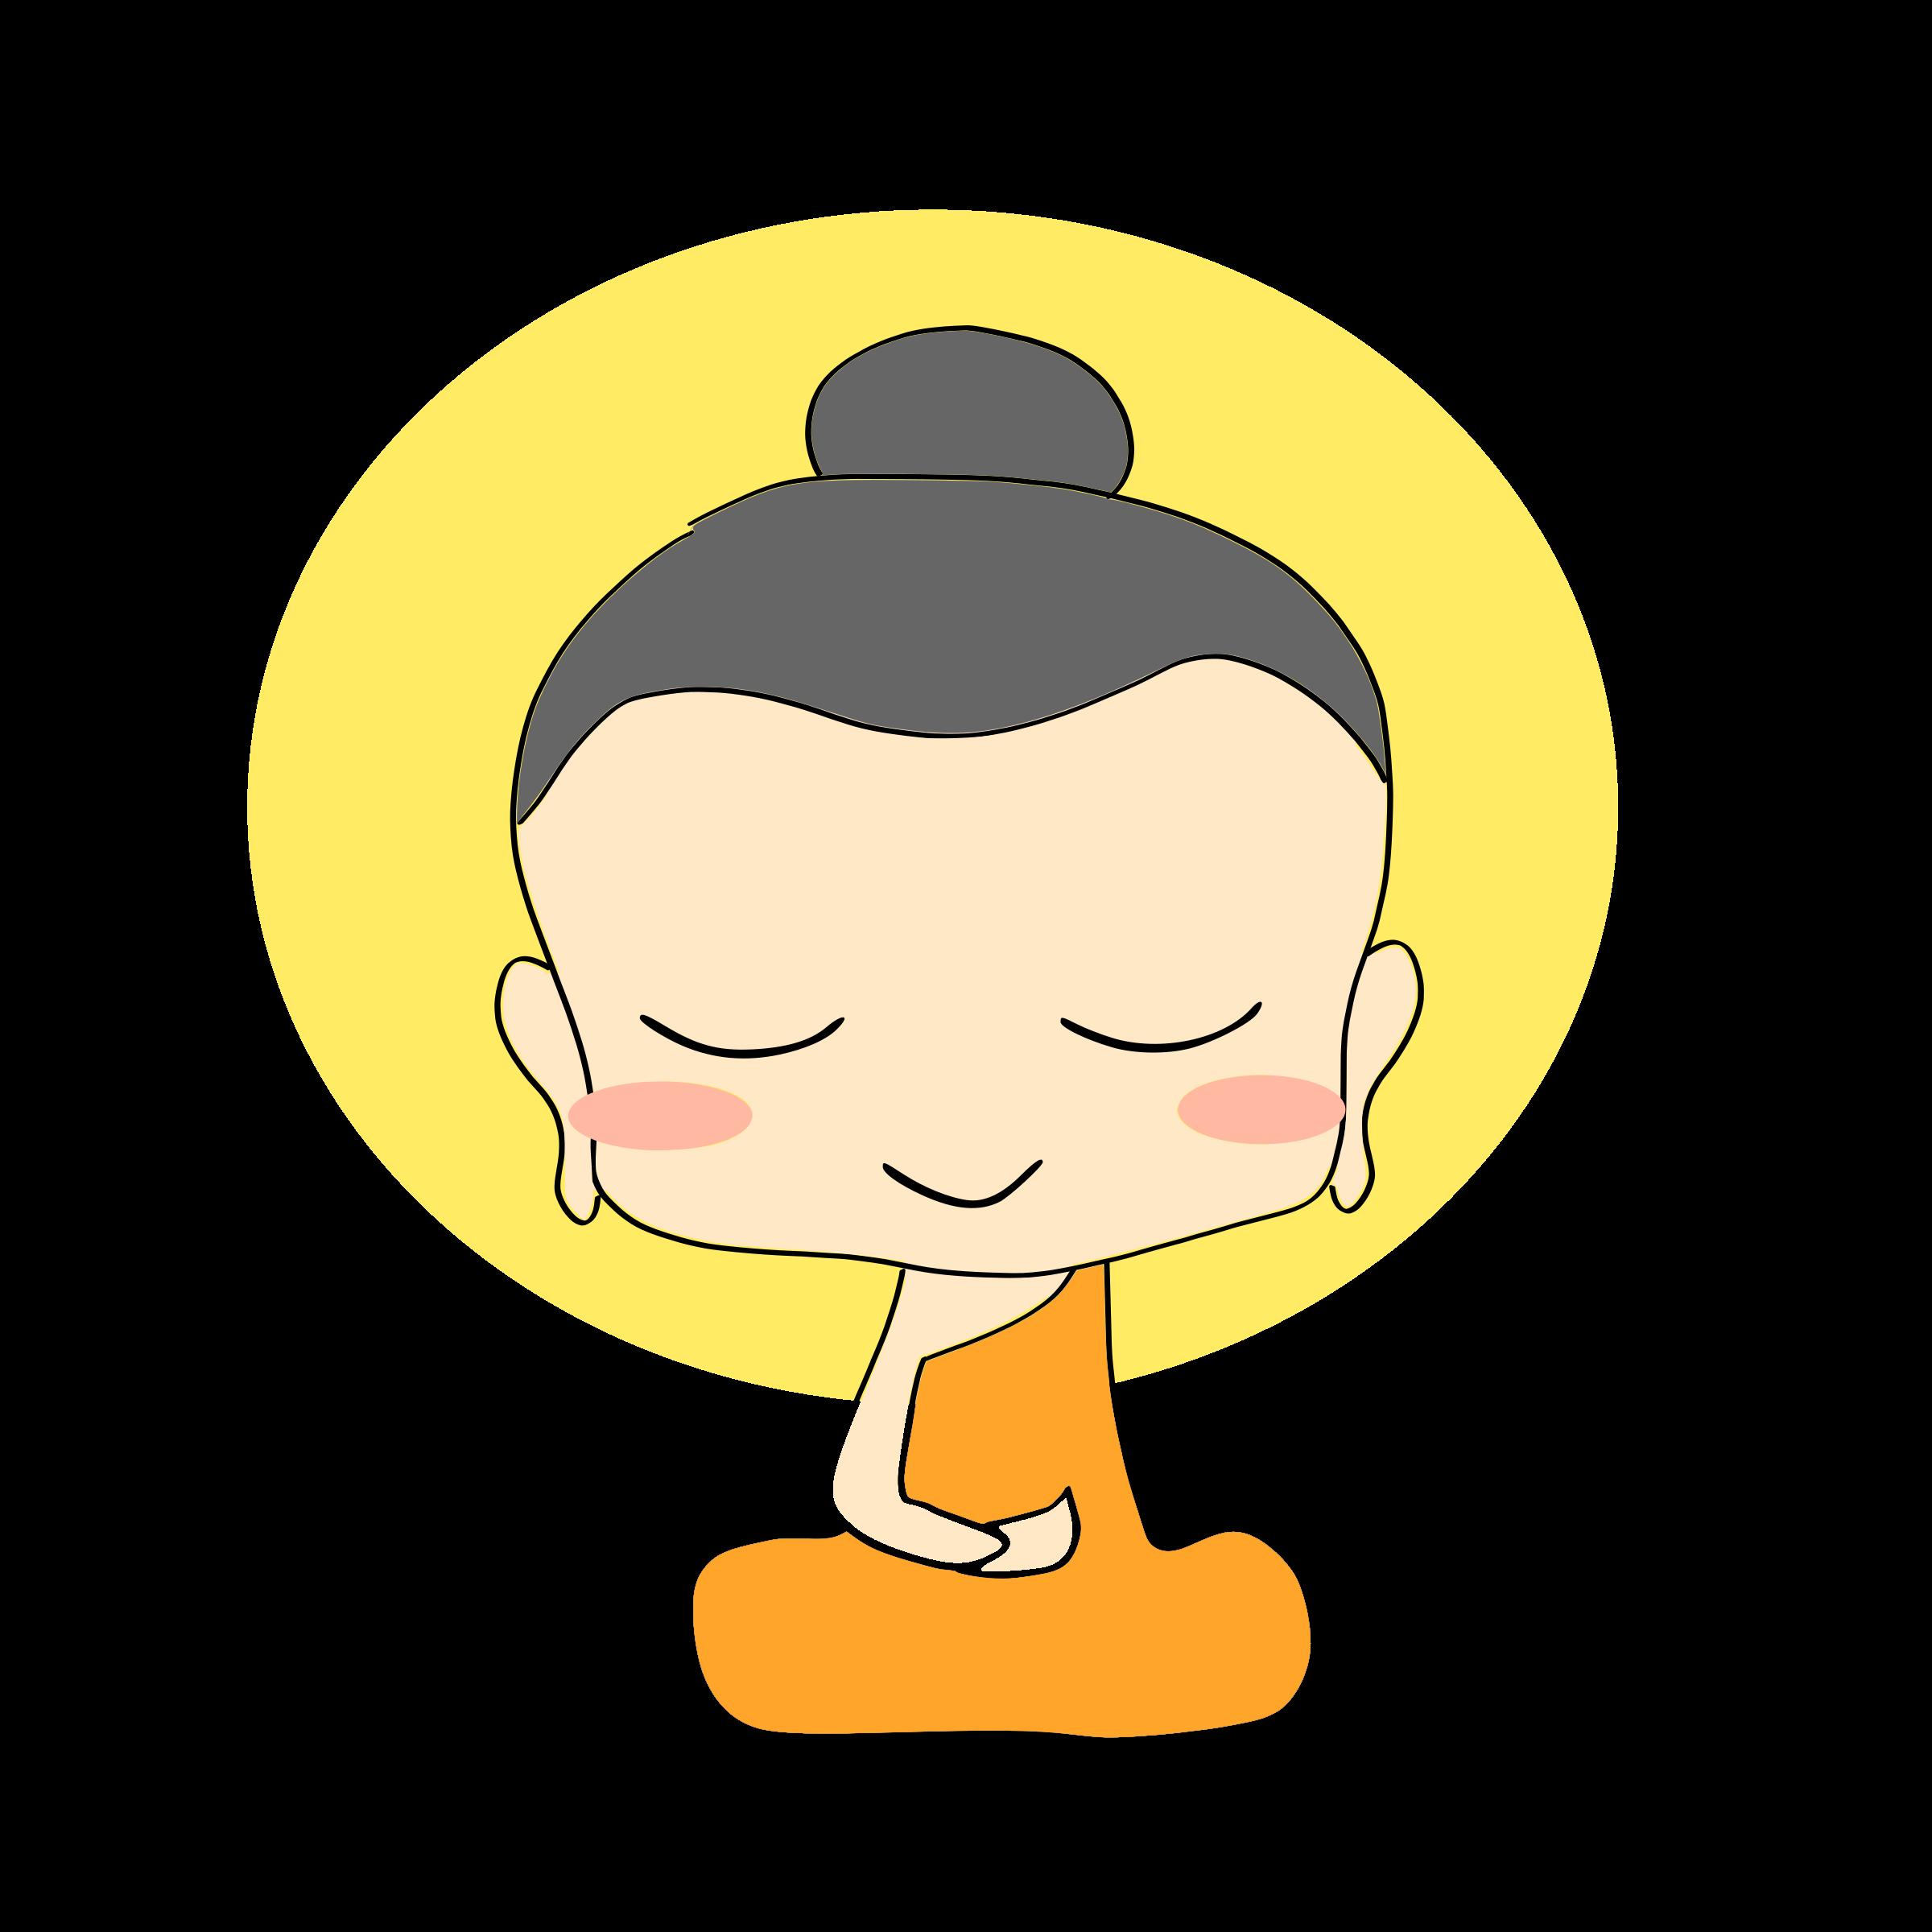 Clipart wedding buddha. Chibi google search app